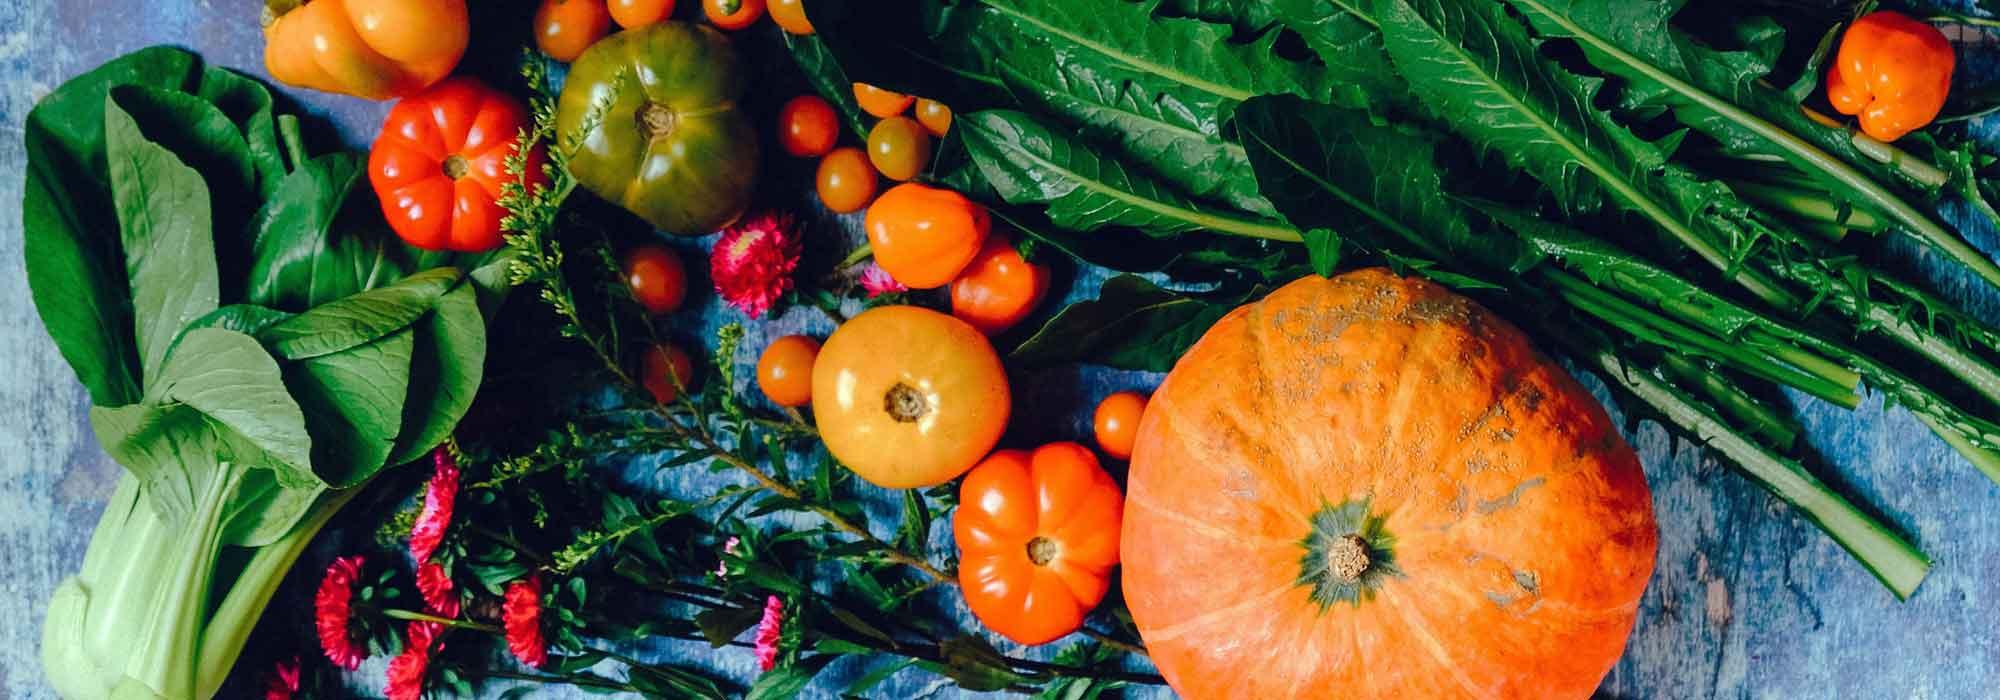 Personal Essence Blogpost zum Thema Ernährung